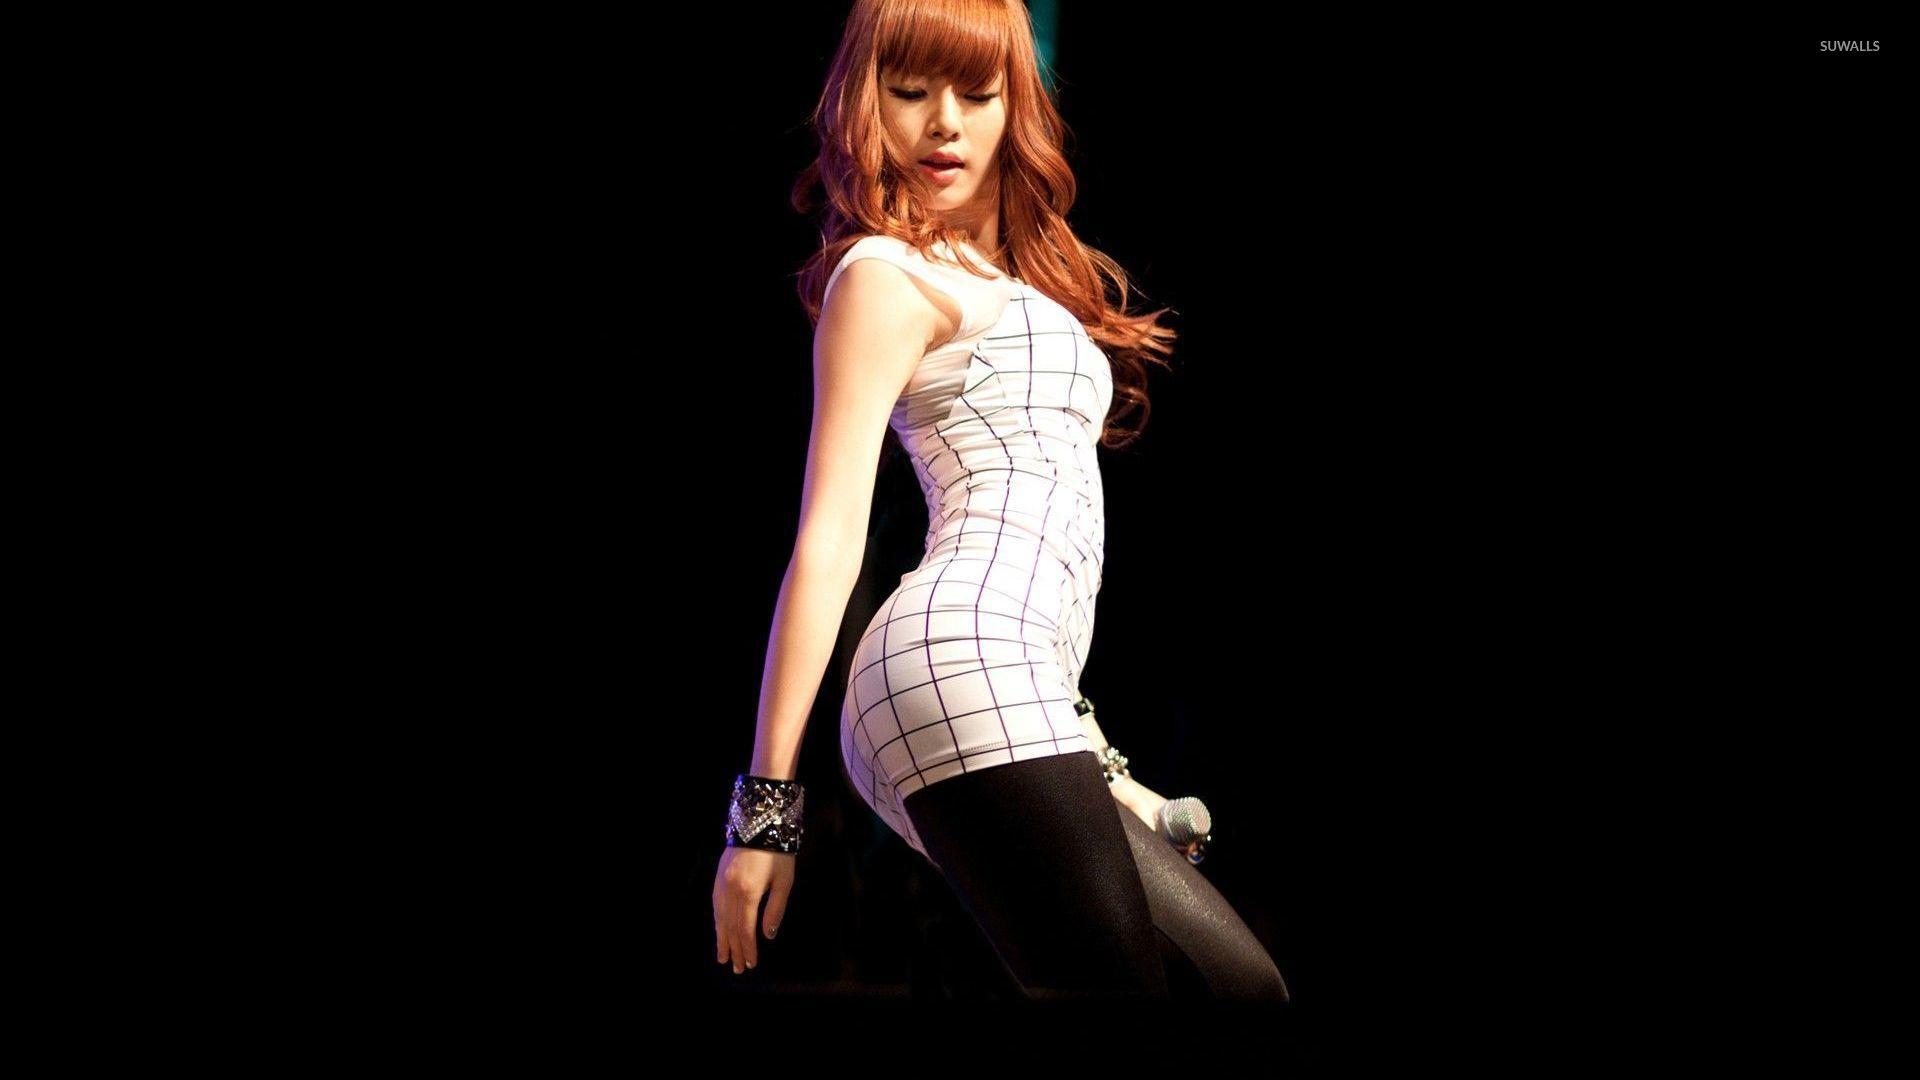 Amy Adams Hd Wallpapers Hyuna 3 Wallpaper Celebrity Wallpapers 28280